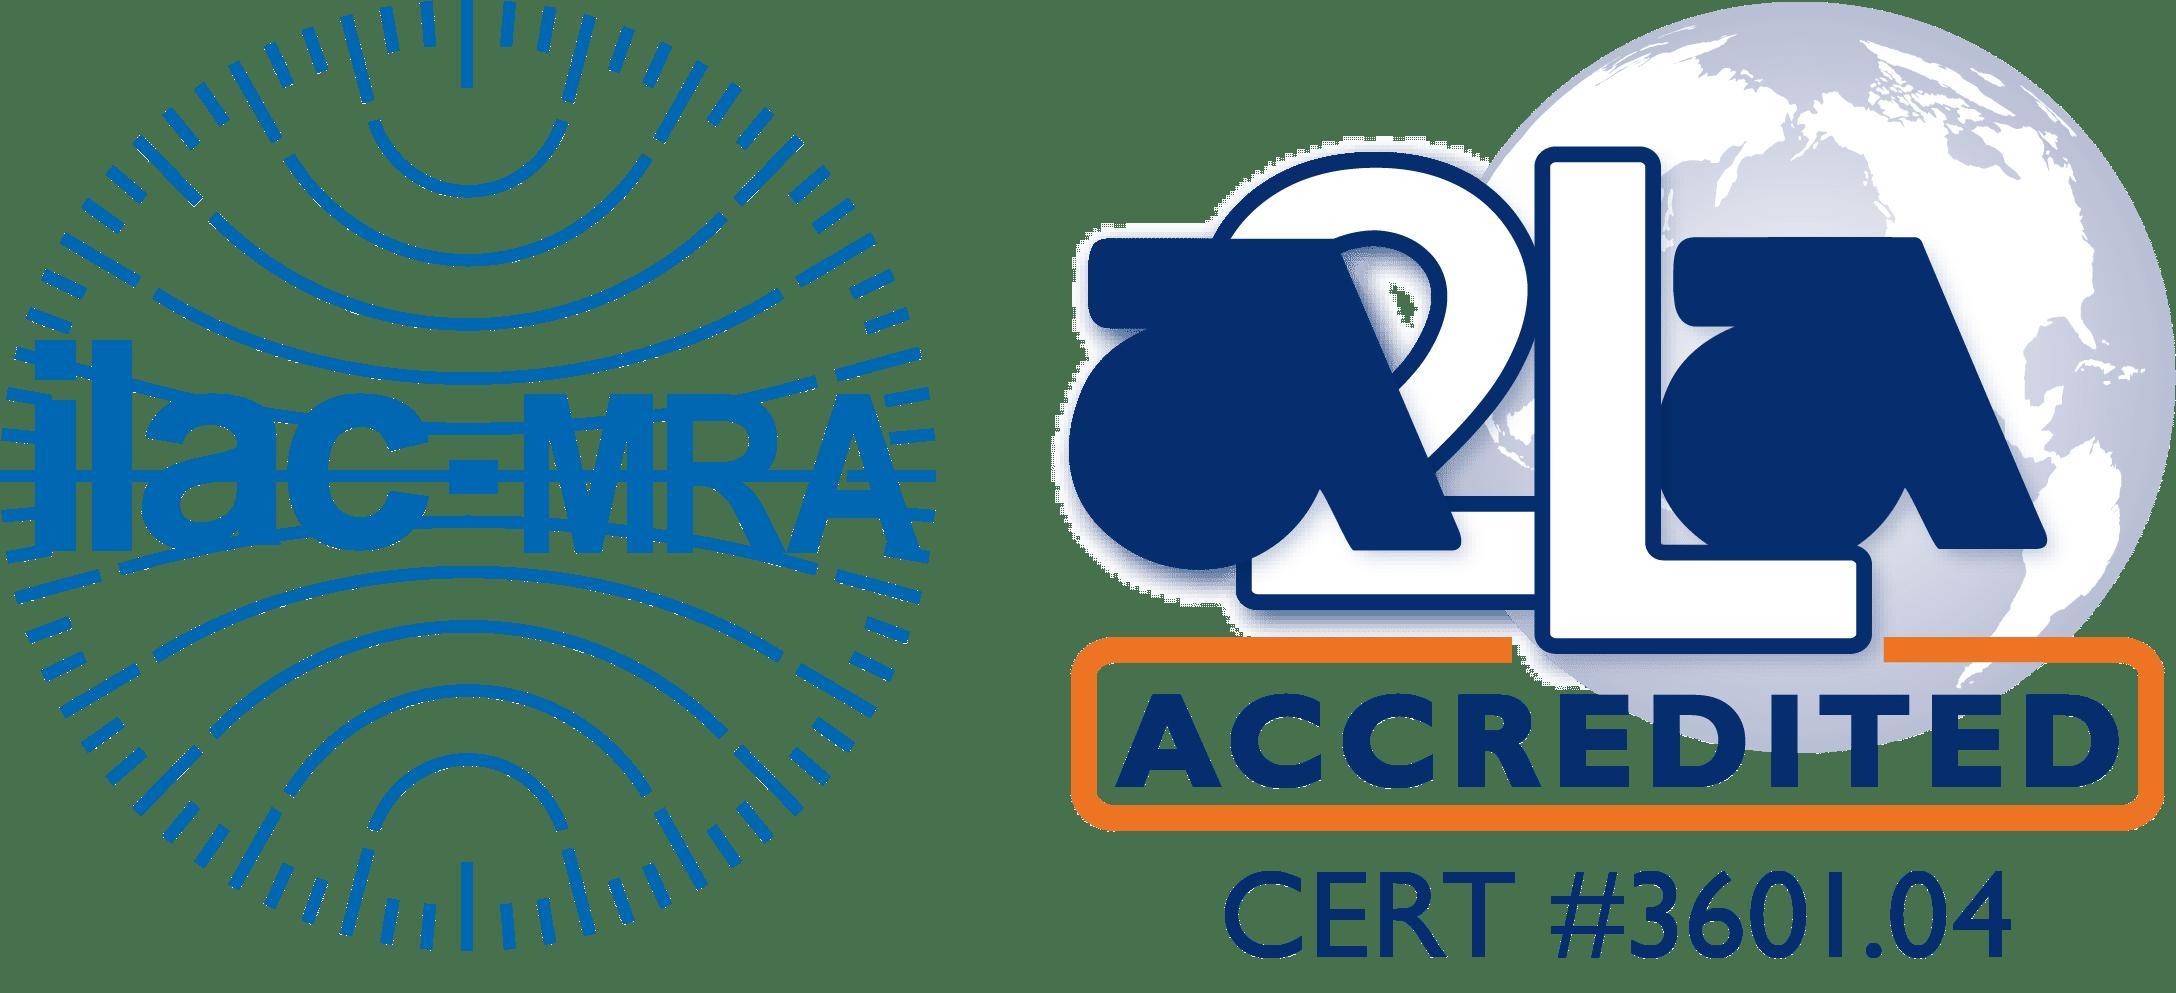 Jackson ilac-mra a2la accredited logo